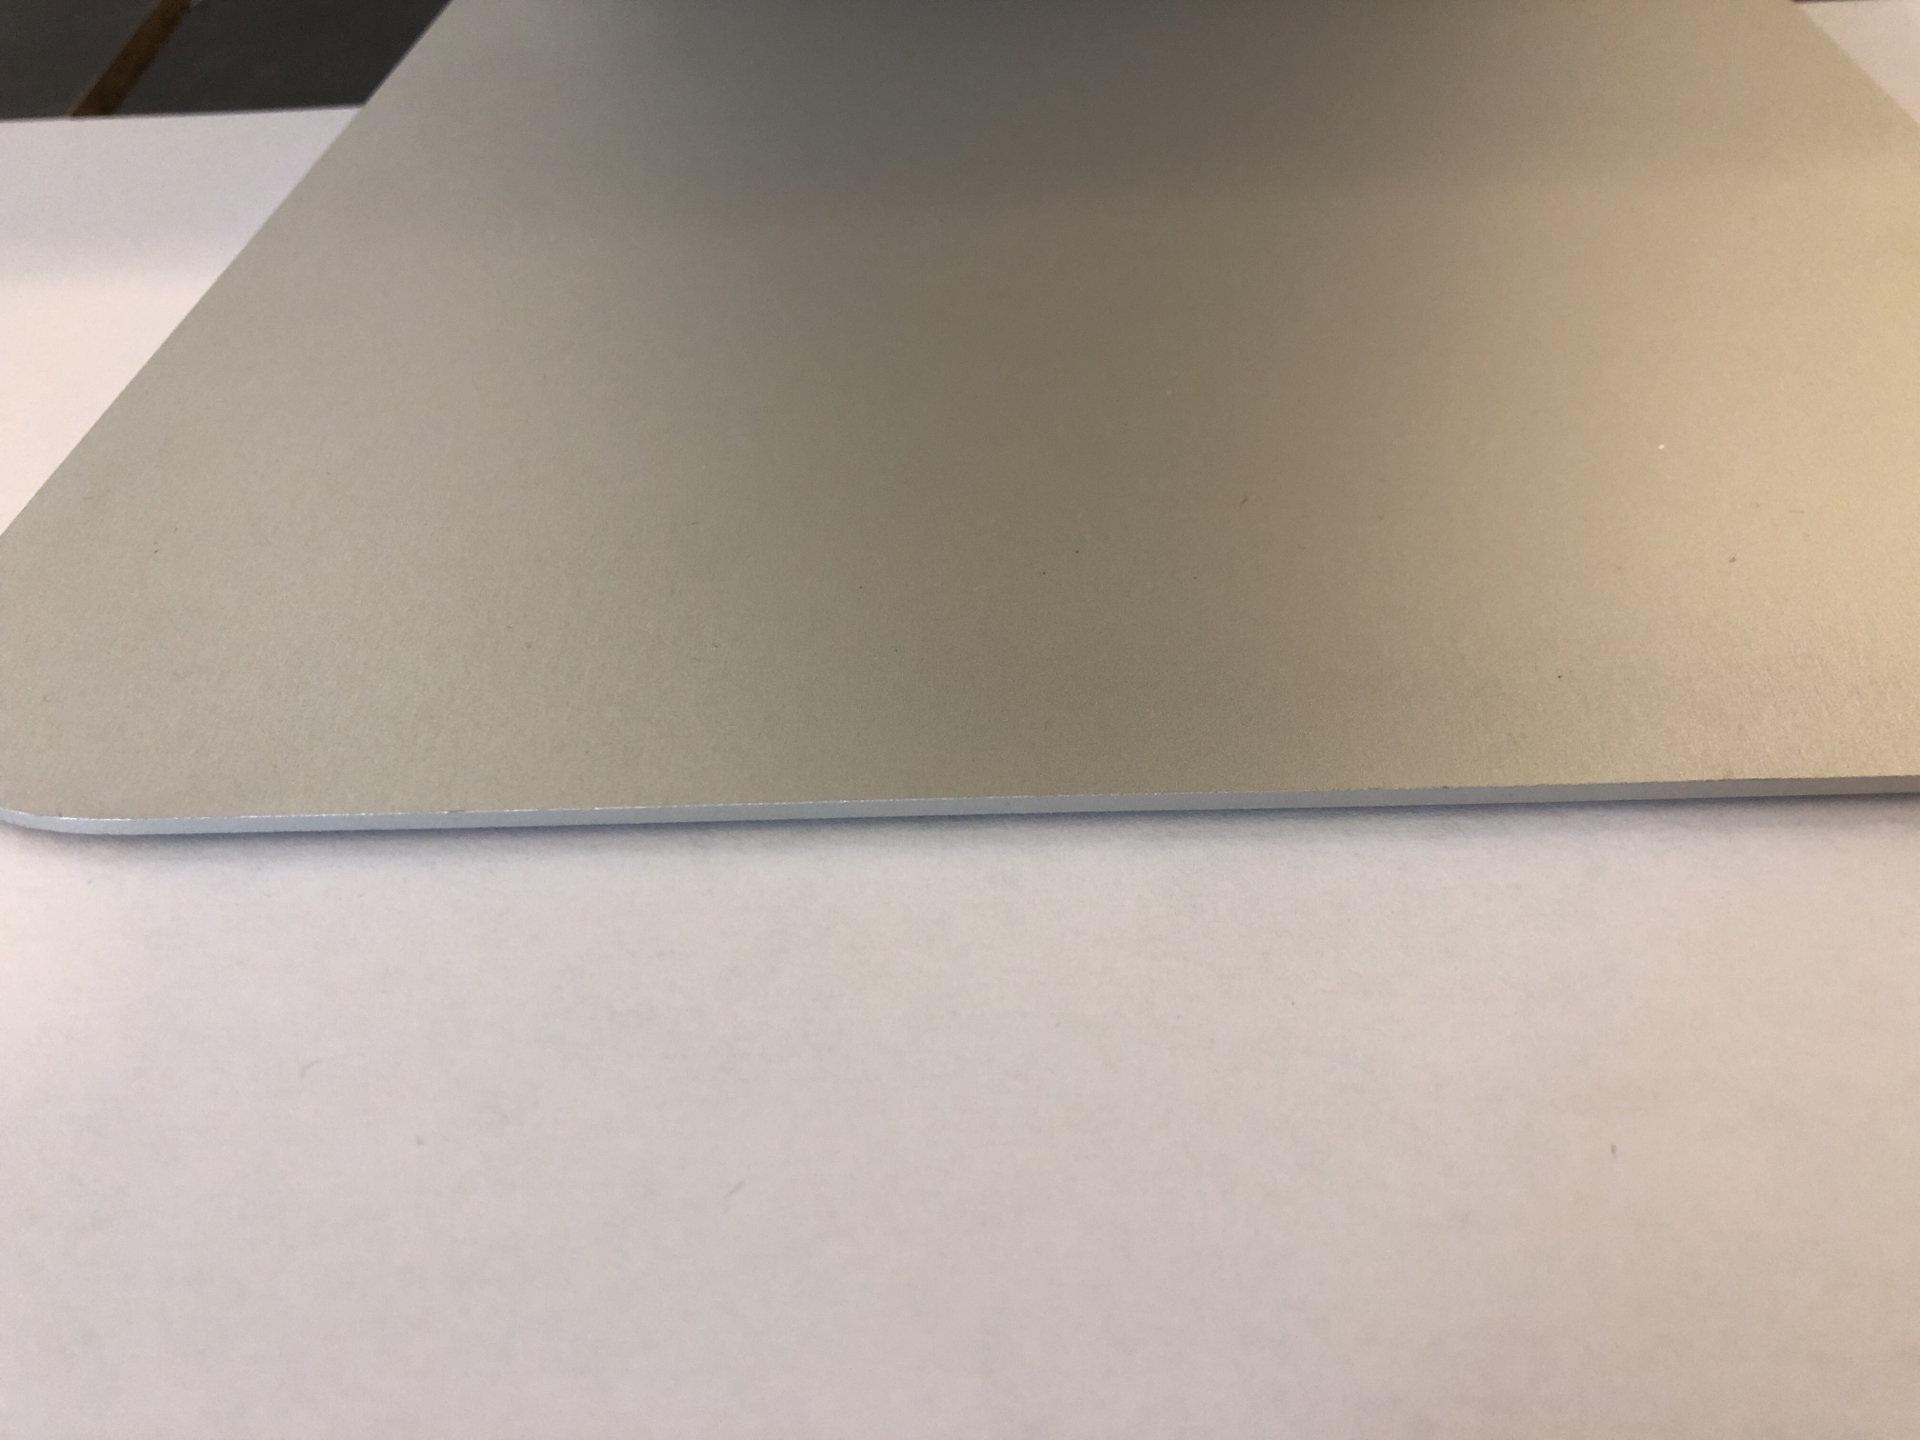 "iMac 27"" Retina 5K Late 2014 (Intel Quad-Core i7 4.0 GHz 32 GB RAM 3 TB Fusion Drive), Intel Quad-Core i7 4.0 GHz, 32 GB RAM, 3 TB Fusion Drive, image 4"